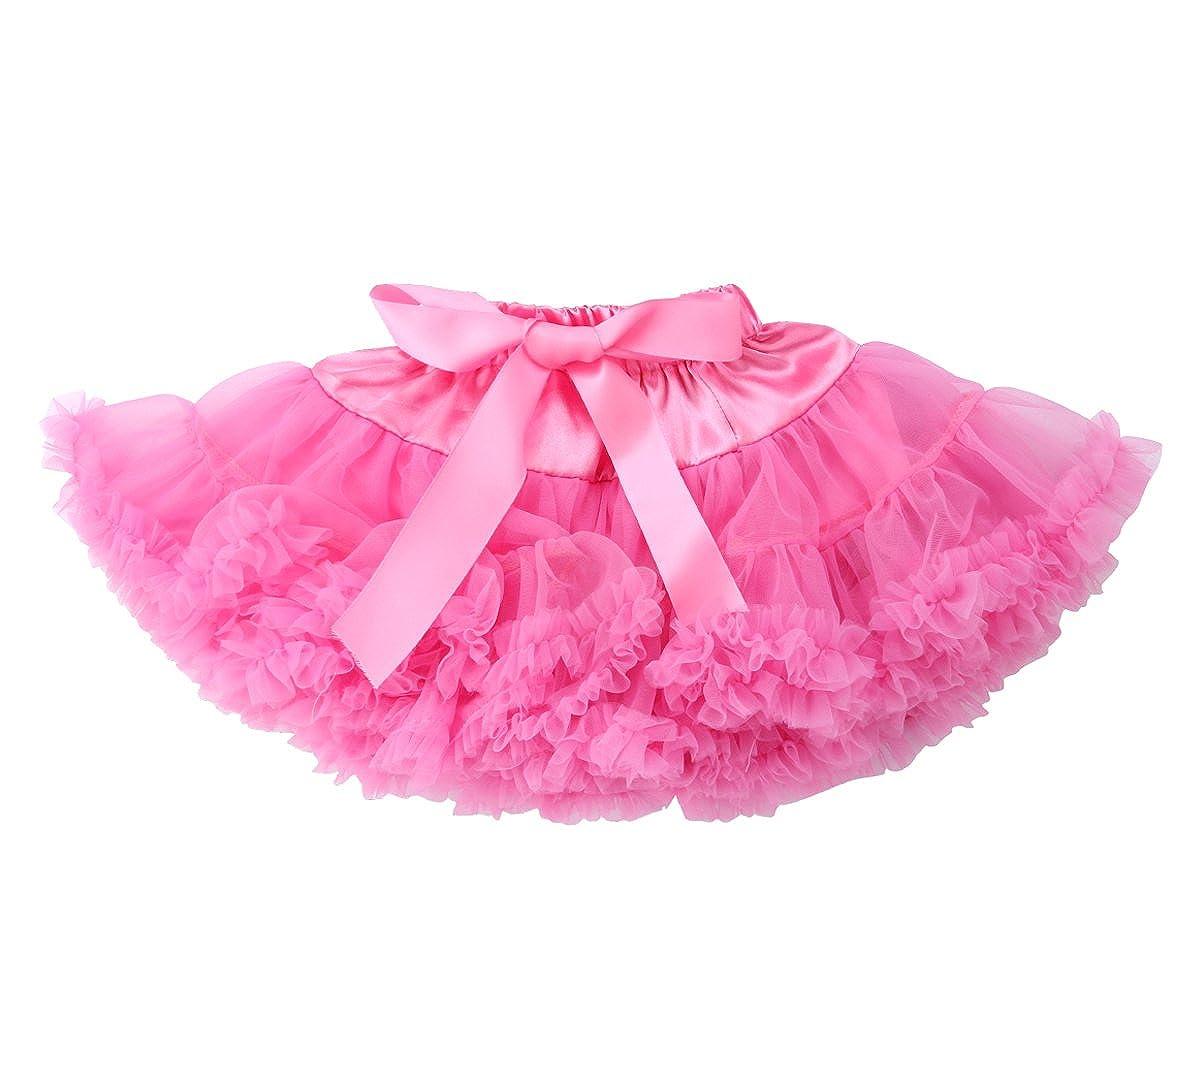 Dinlong Summer Toddler Baby Girl Kid Fashion Short Sleeve Flower Printed Princess Party Dress Long Skirt